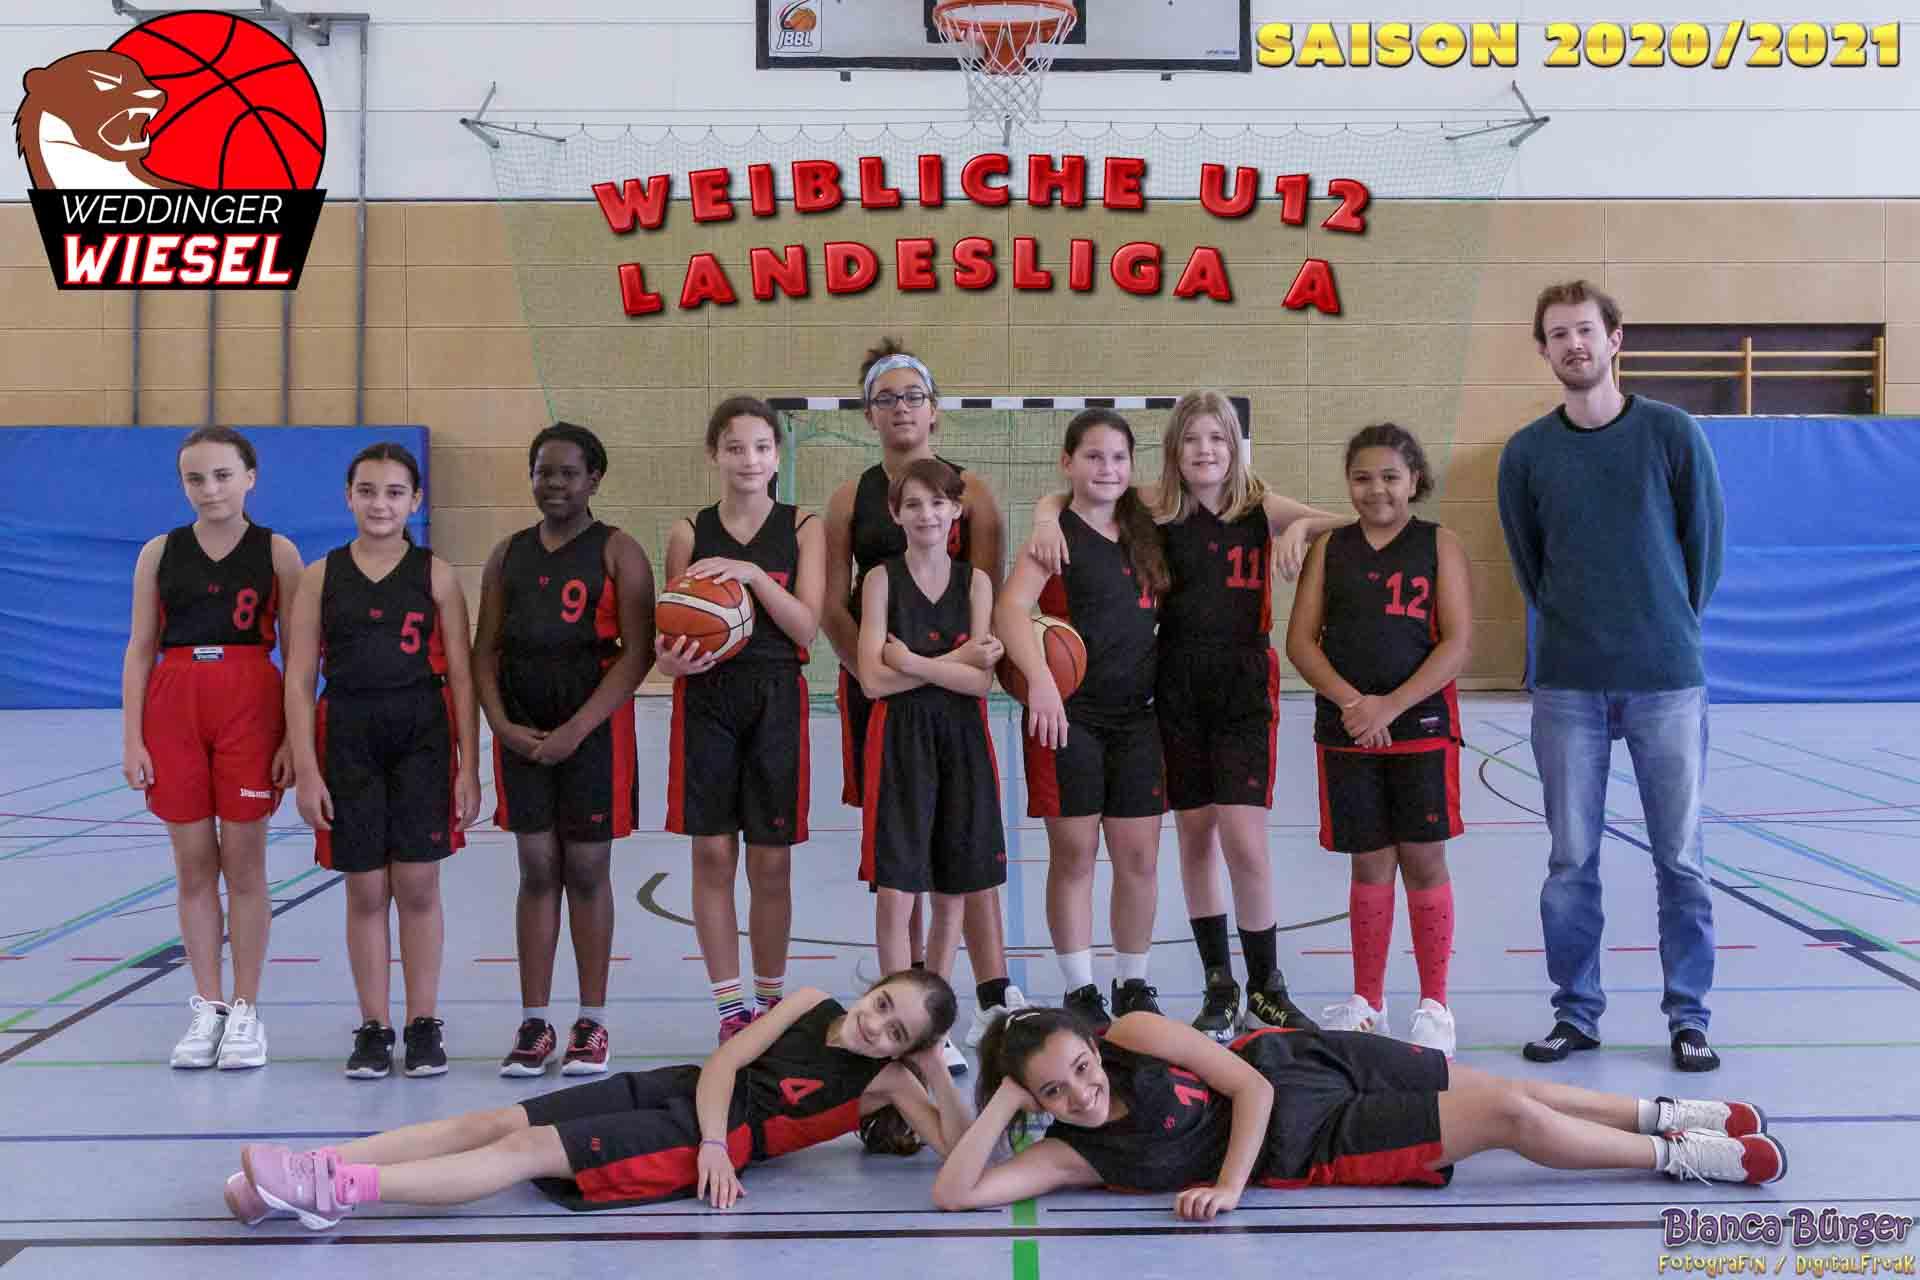 Team wU12 Weddinger Wiesel Saison 2020-2021